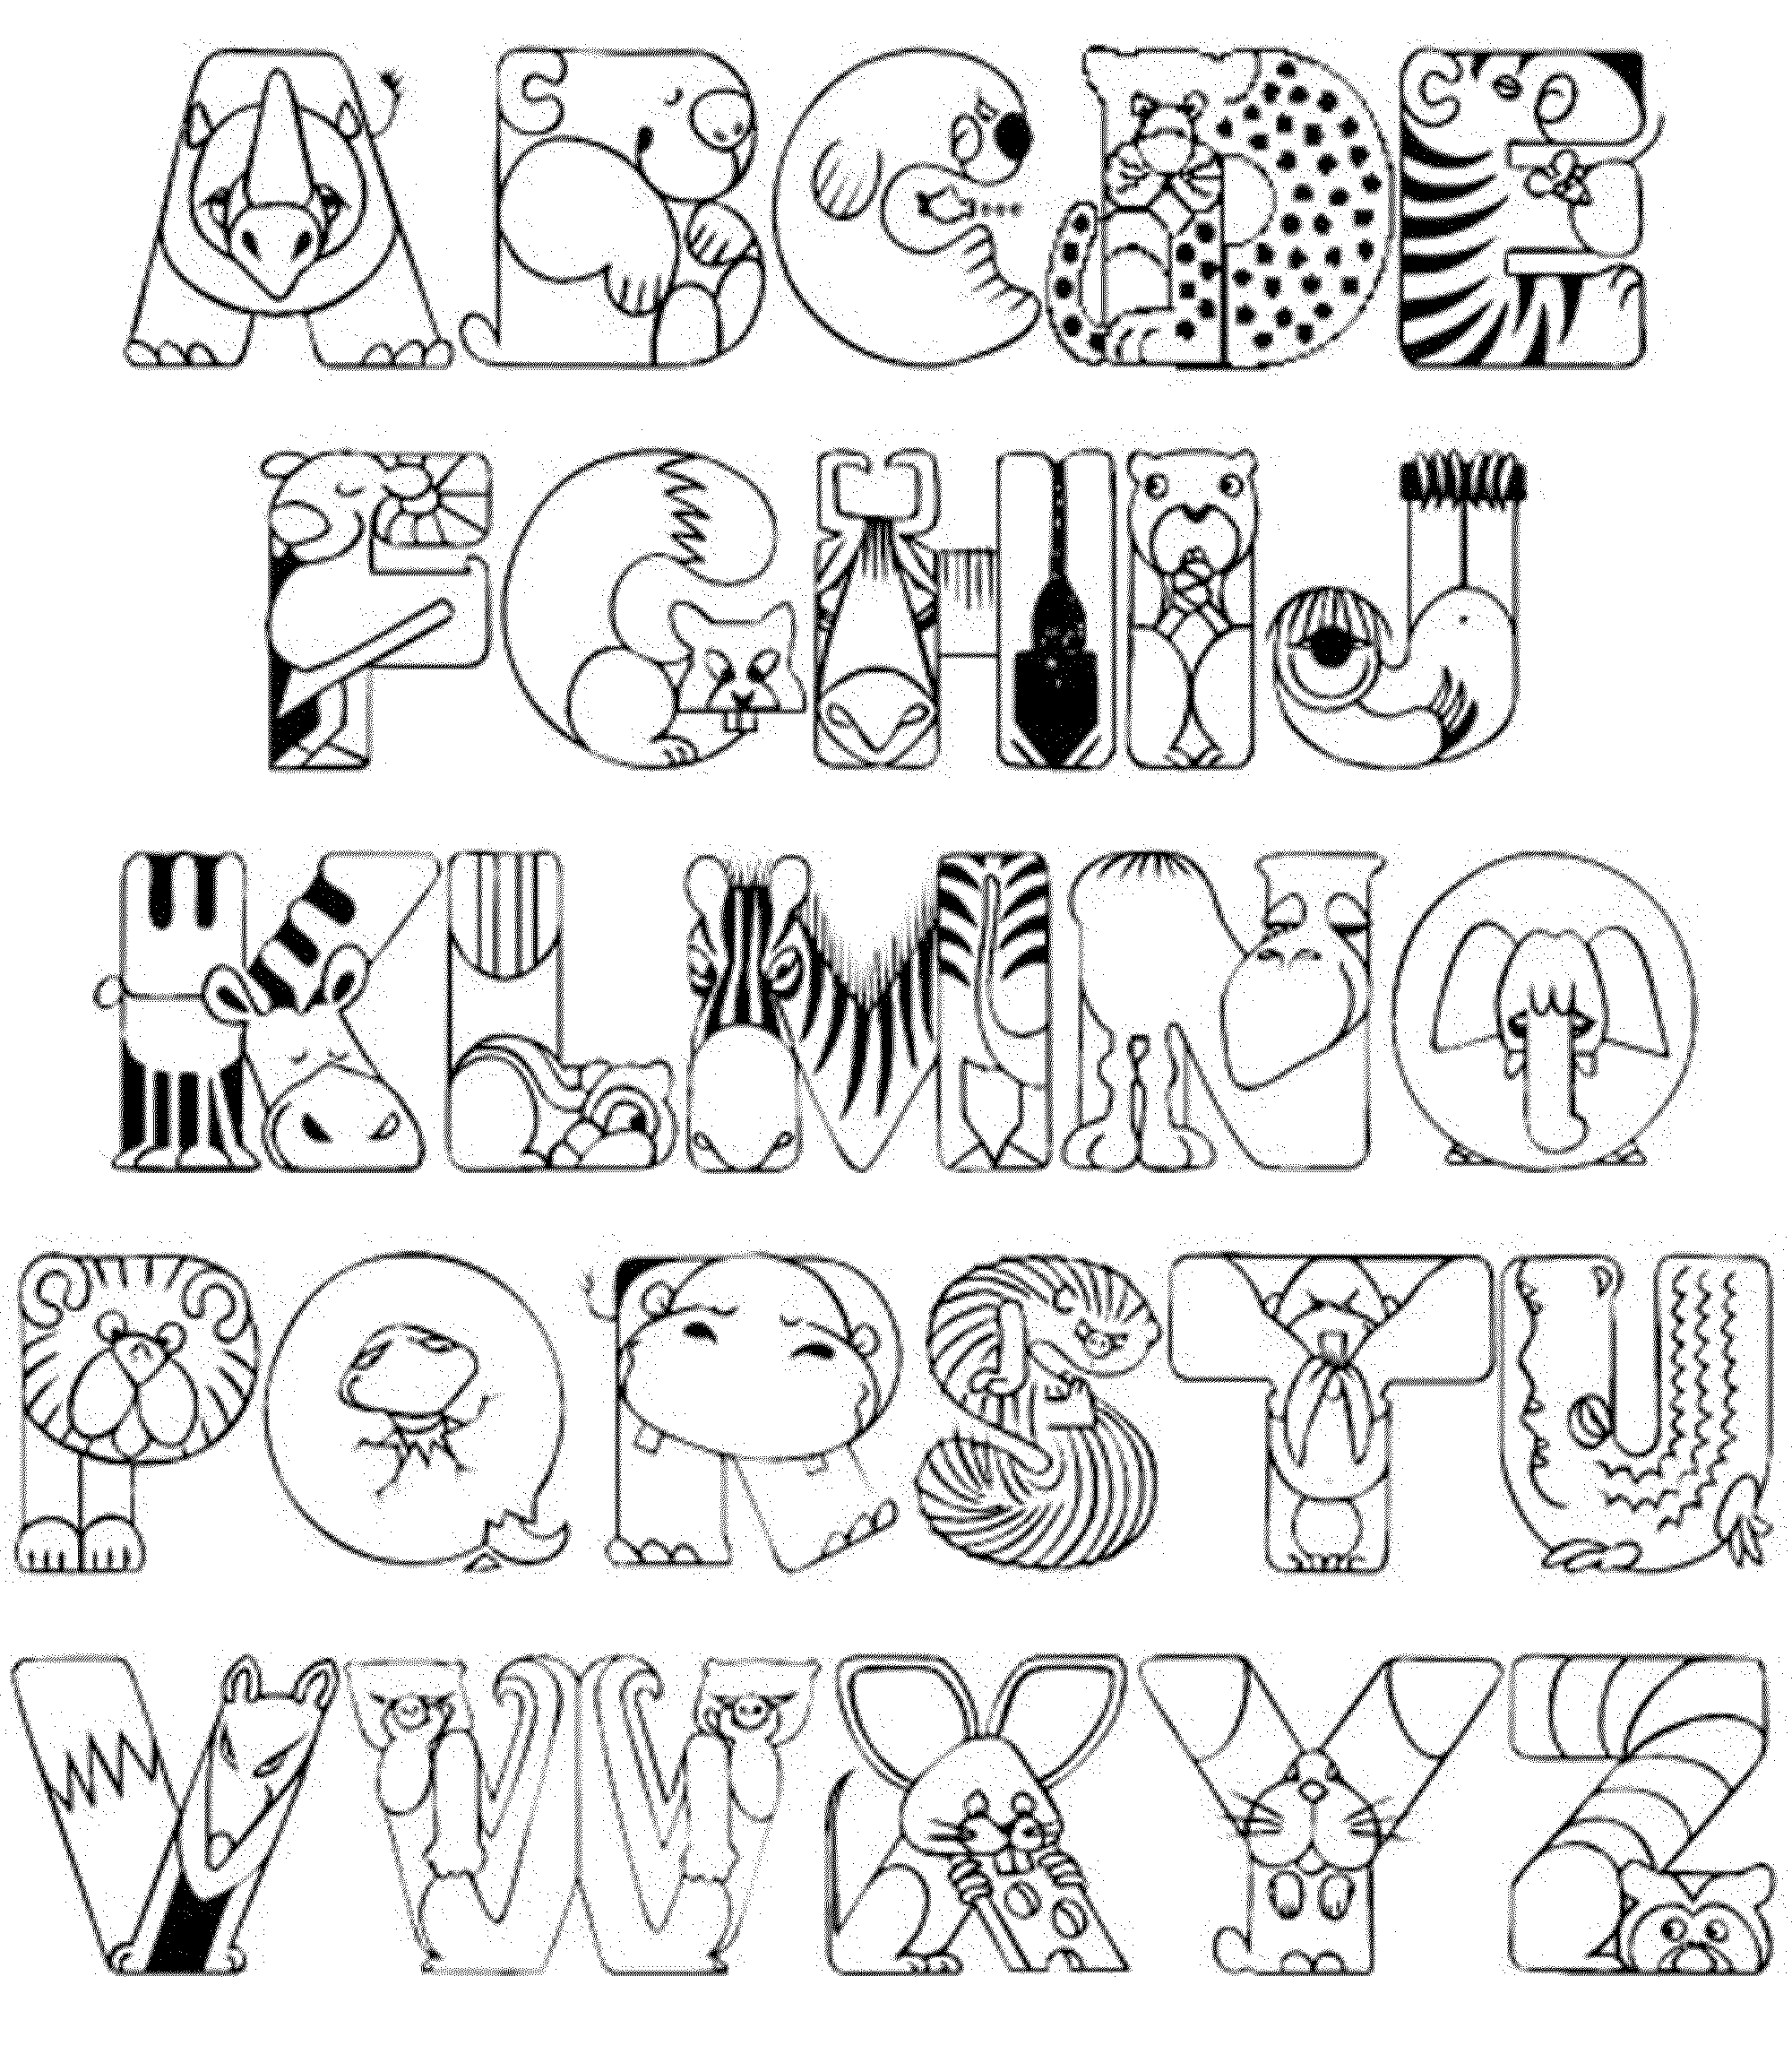 free alphabet coloring pages whole alphabet coloring pages free printable coloring home free coloring alphabet pages